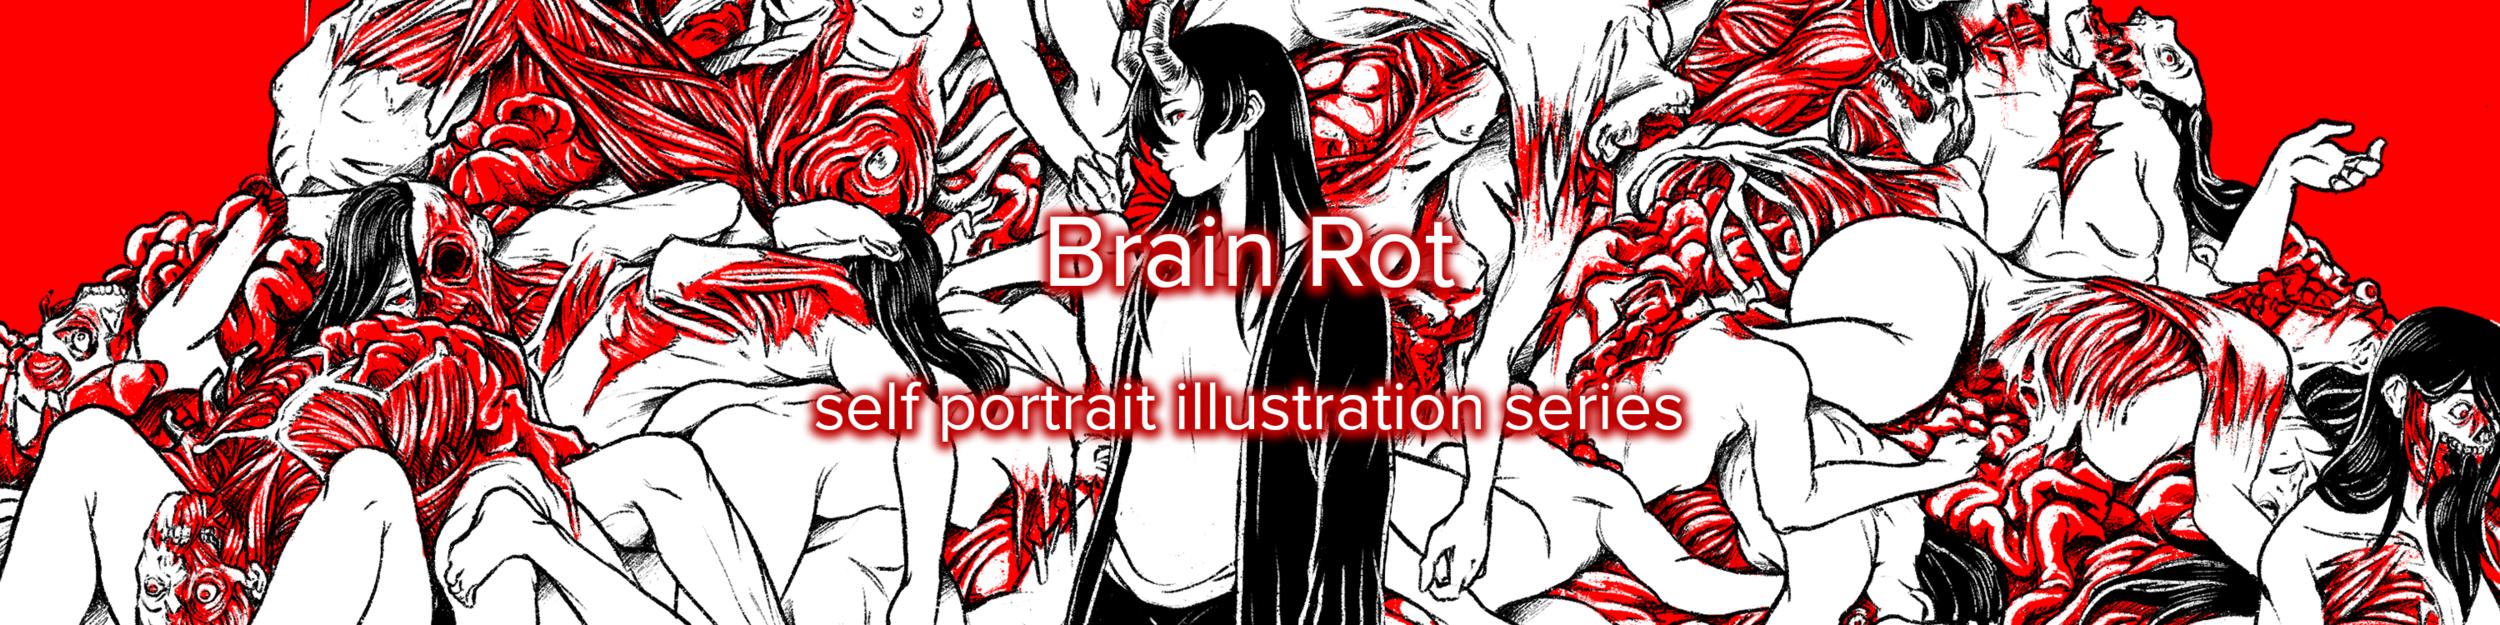 jasminekayart_brainrot_project_banners.png